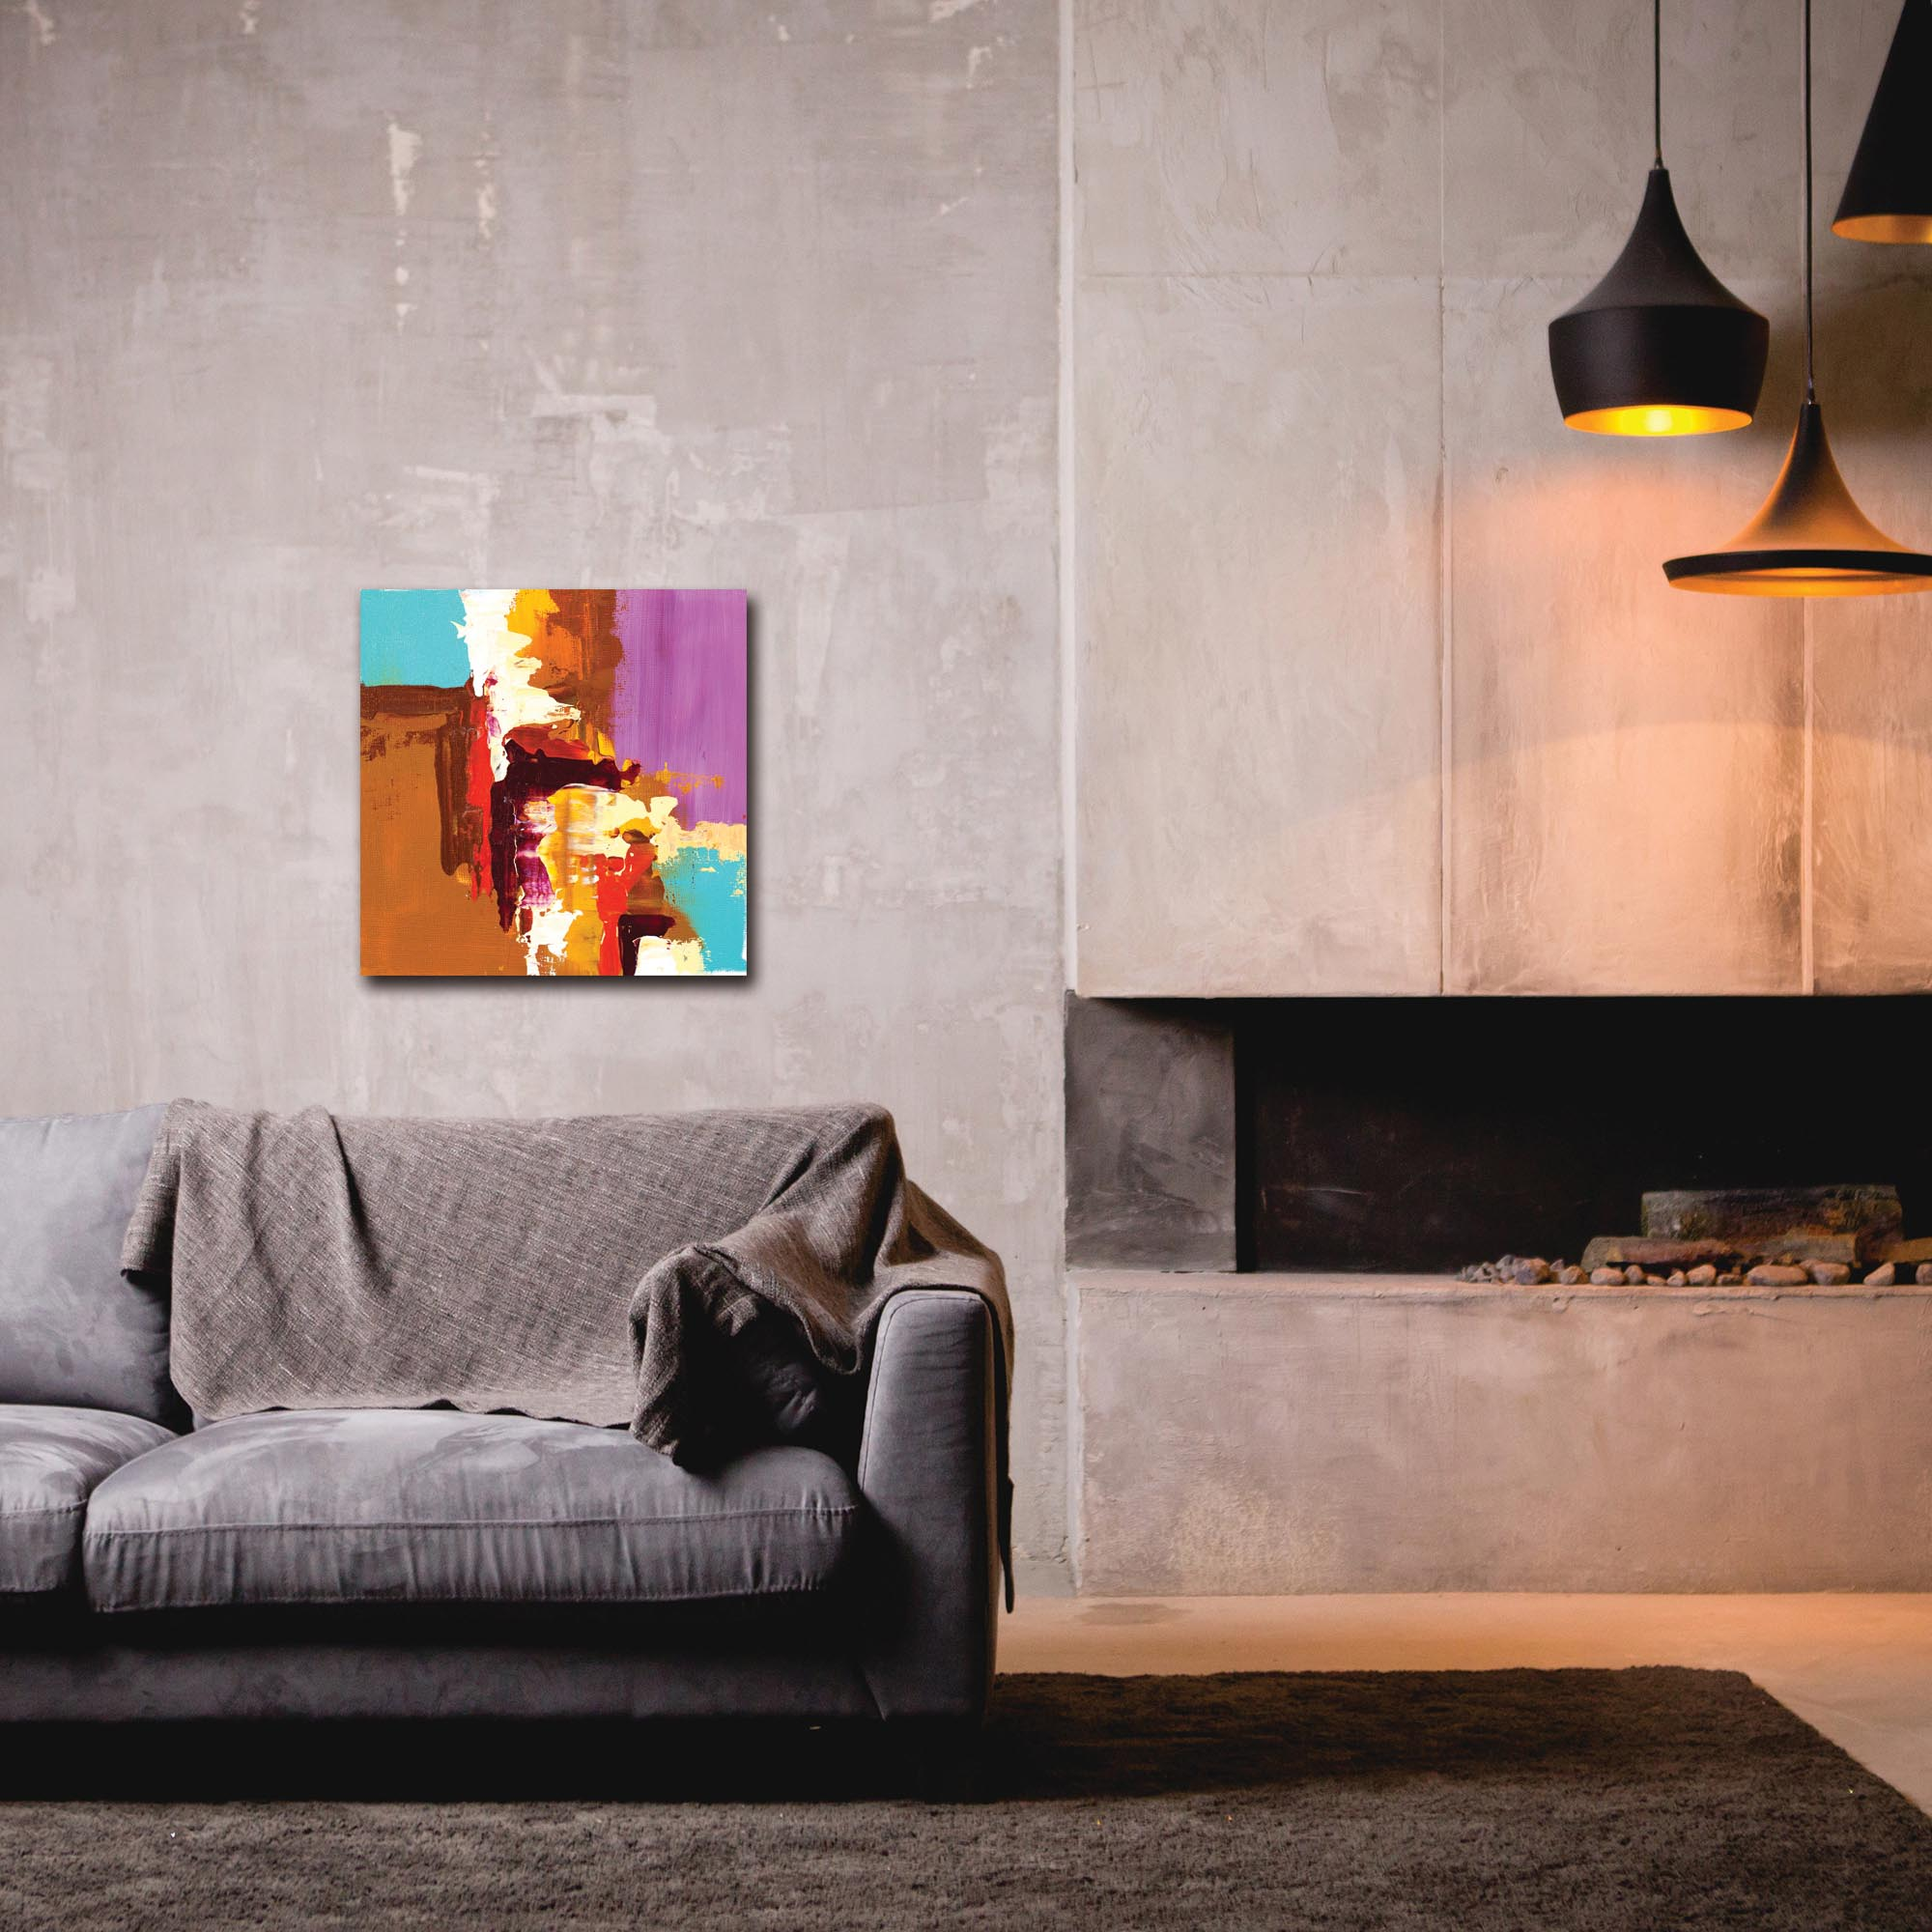 Abstract Wall Art 'Urban Life 12' - Urban Decor on Metal or Plexiglass - Lifestyle View